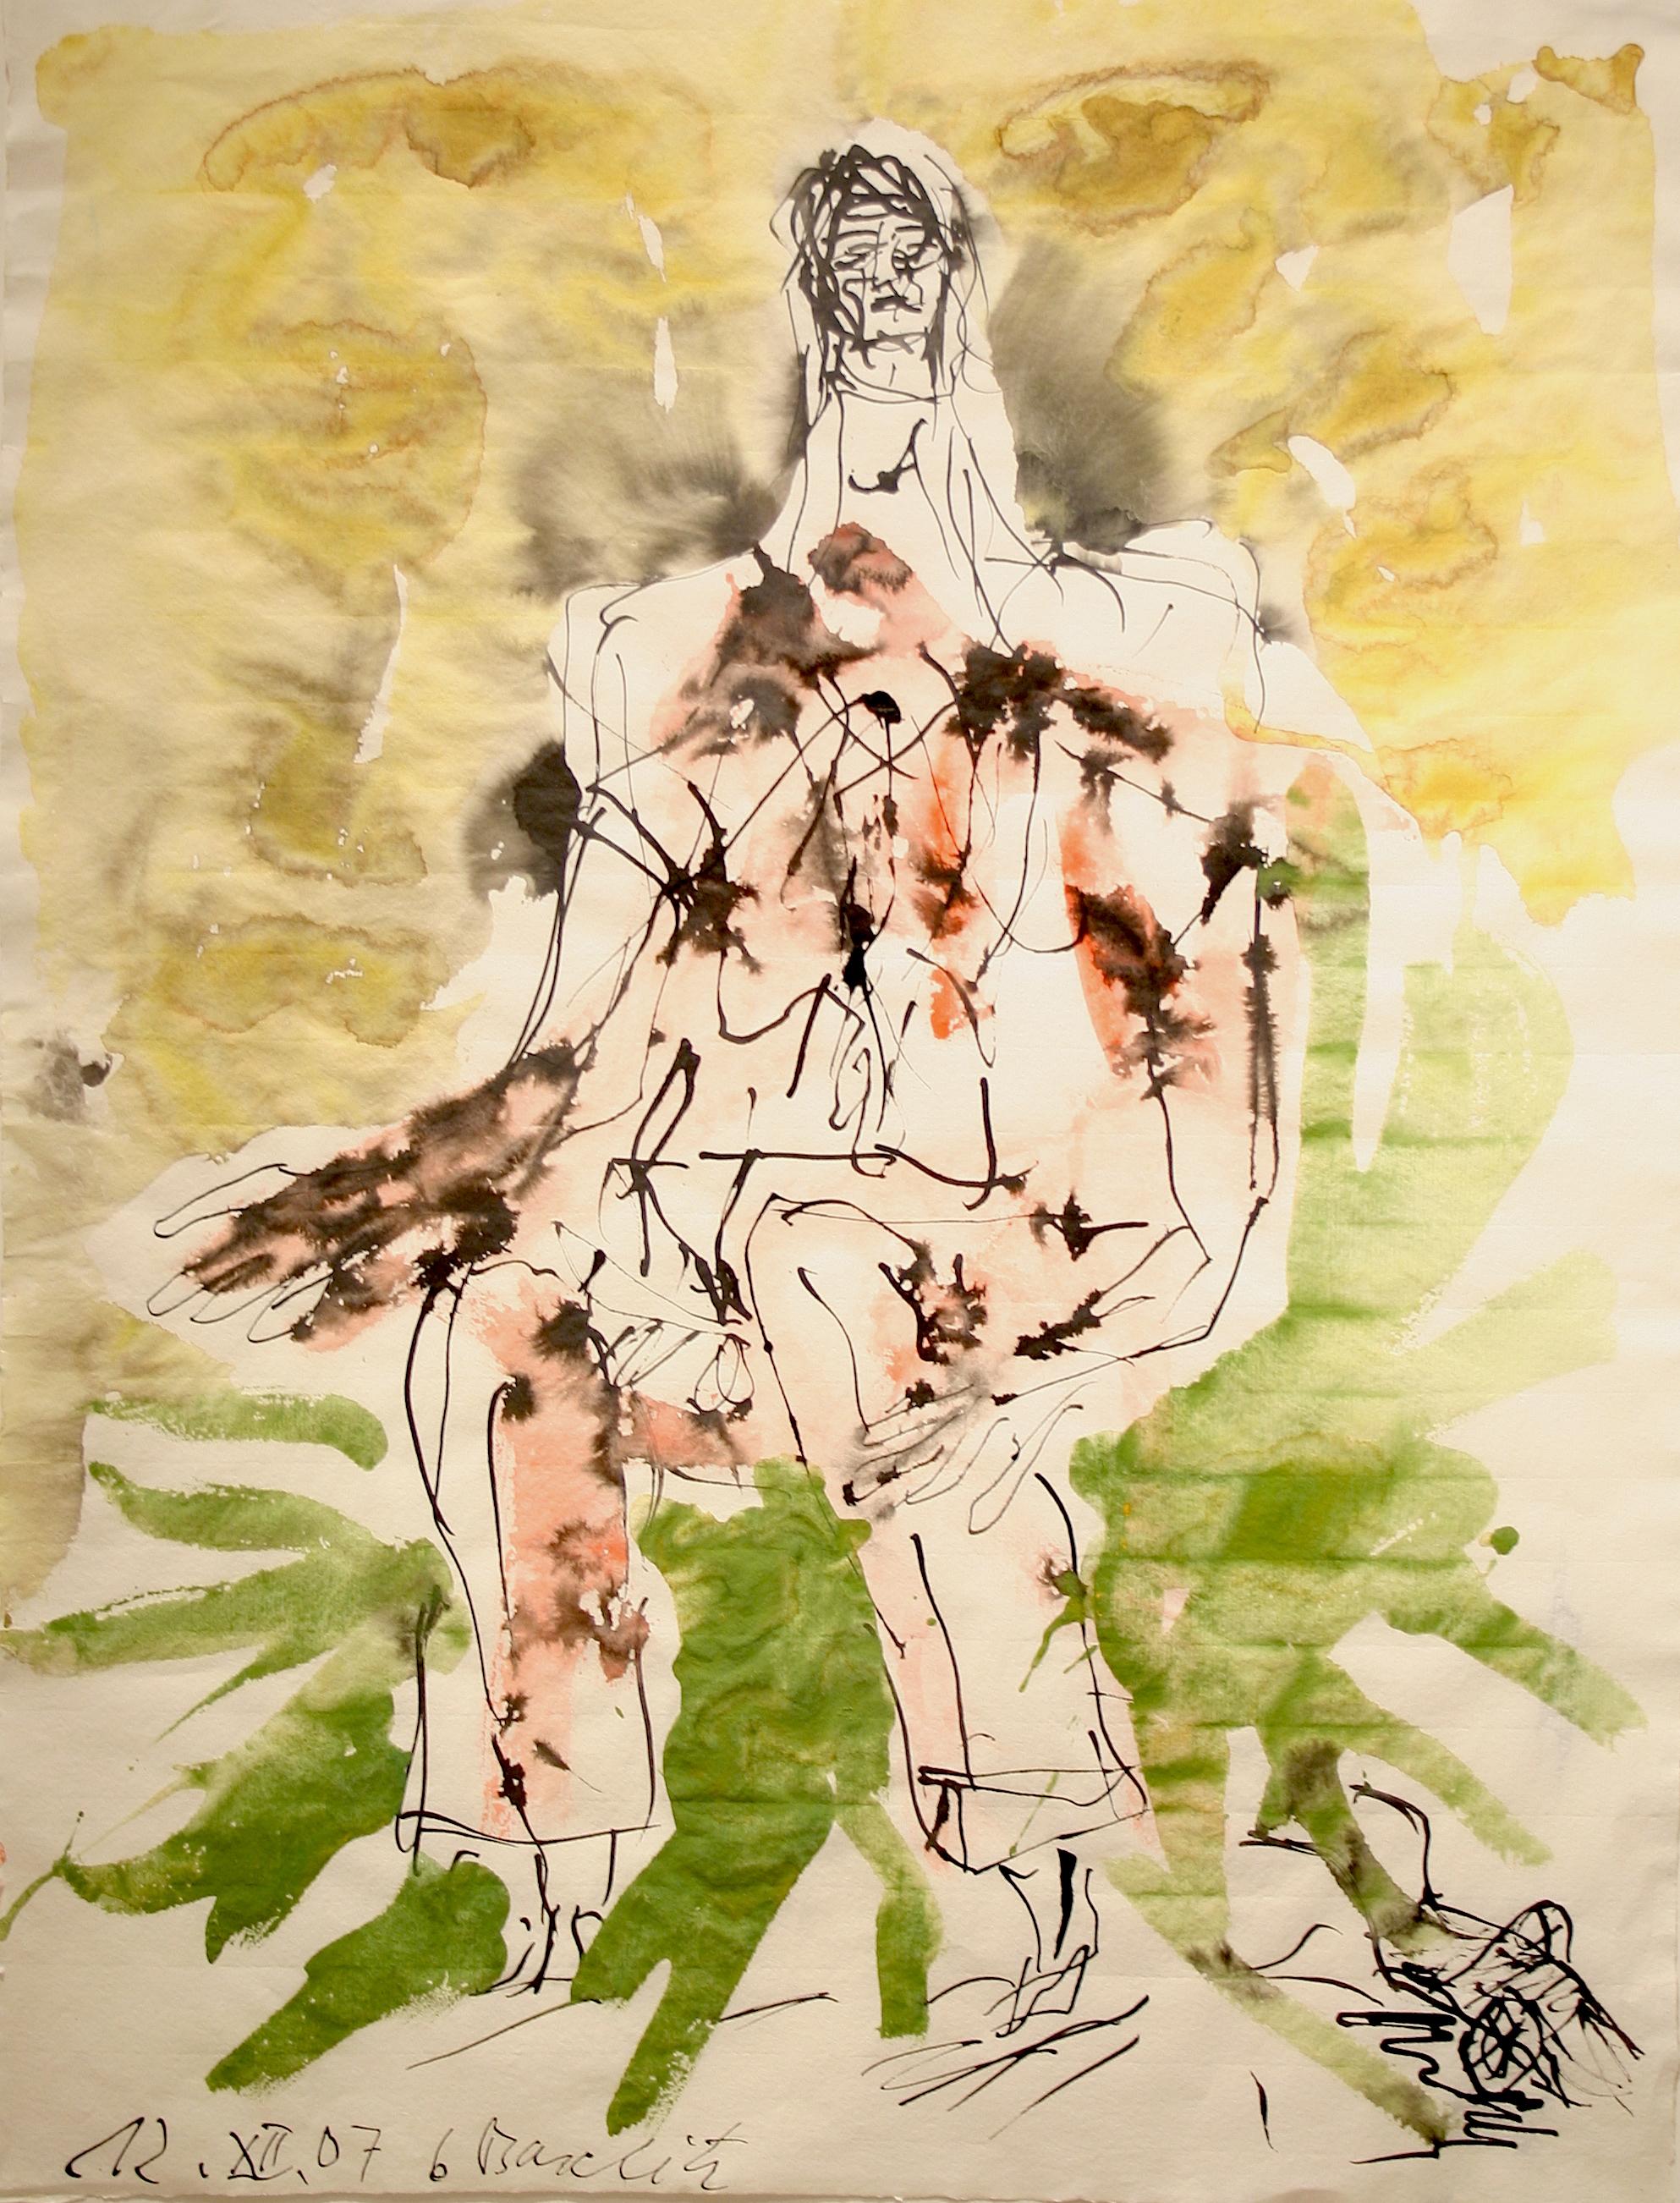 Georg Baselitz Hirte (Remix), 2007 Tusche und Aquarellauf Bütten 66,8 x 50,8 cm | 26 1/3 x 20 in GB/P 4